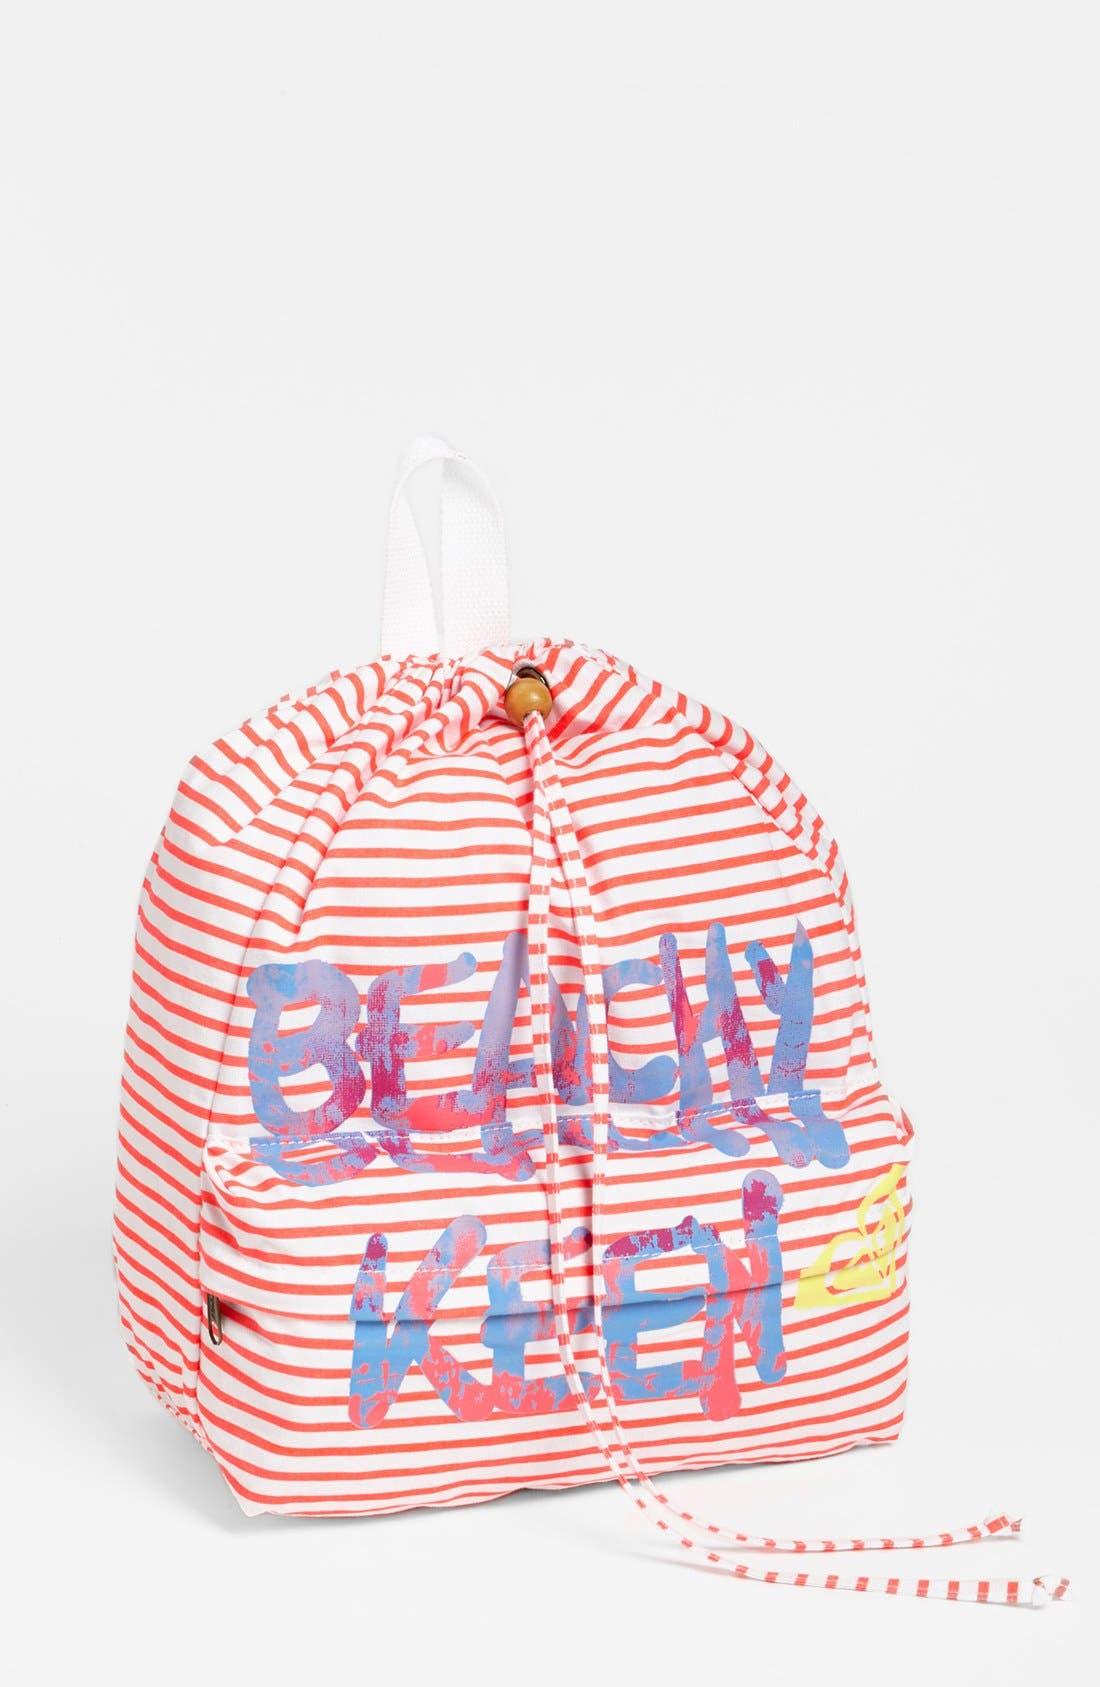 Alternate Image 1 Selected - Roxy 'Pinch It Up' Beach Bag (Girls)